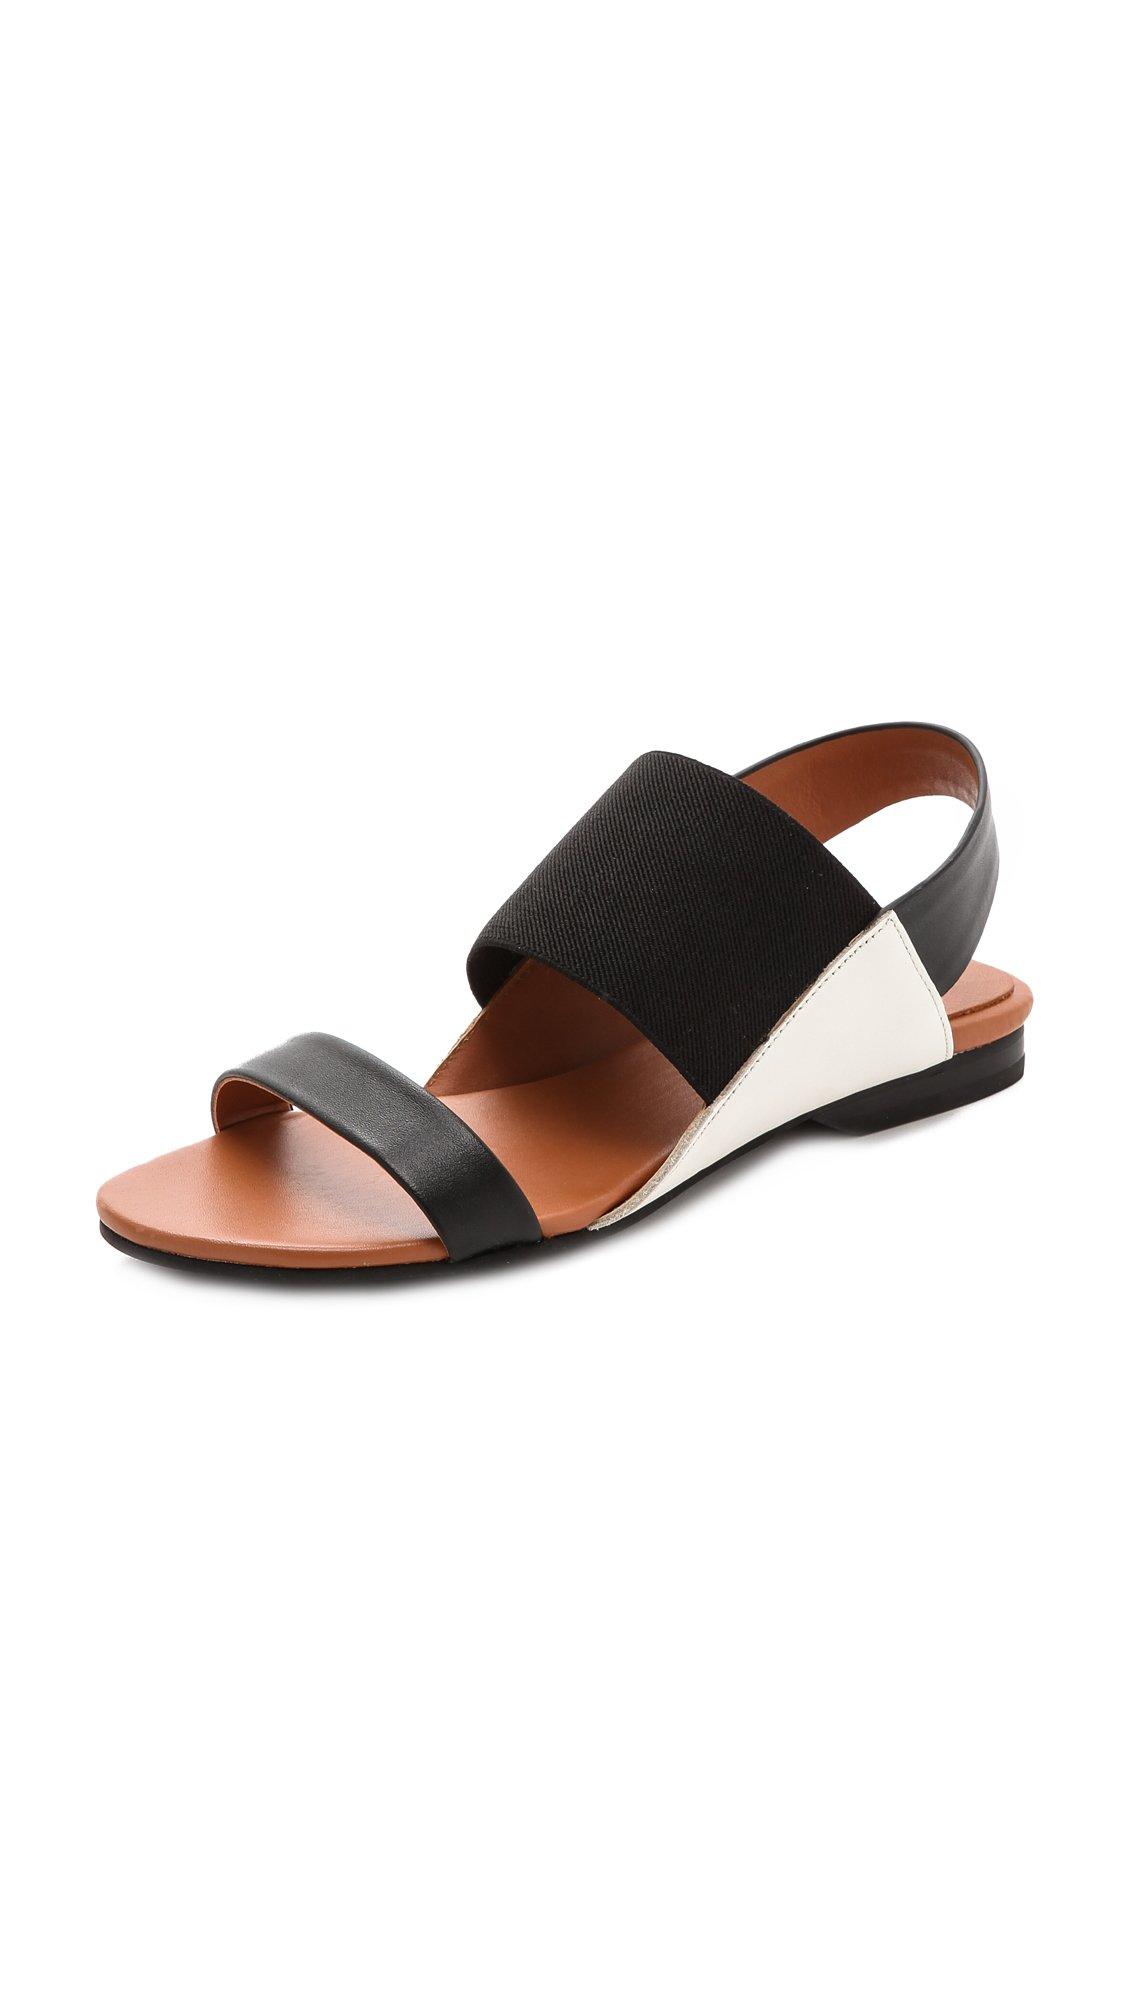 UNITED NUDE : apollo lo sandal black gold   Sumally (サマリー)